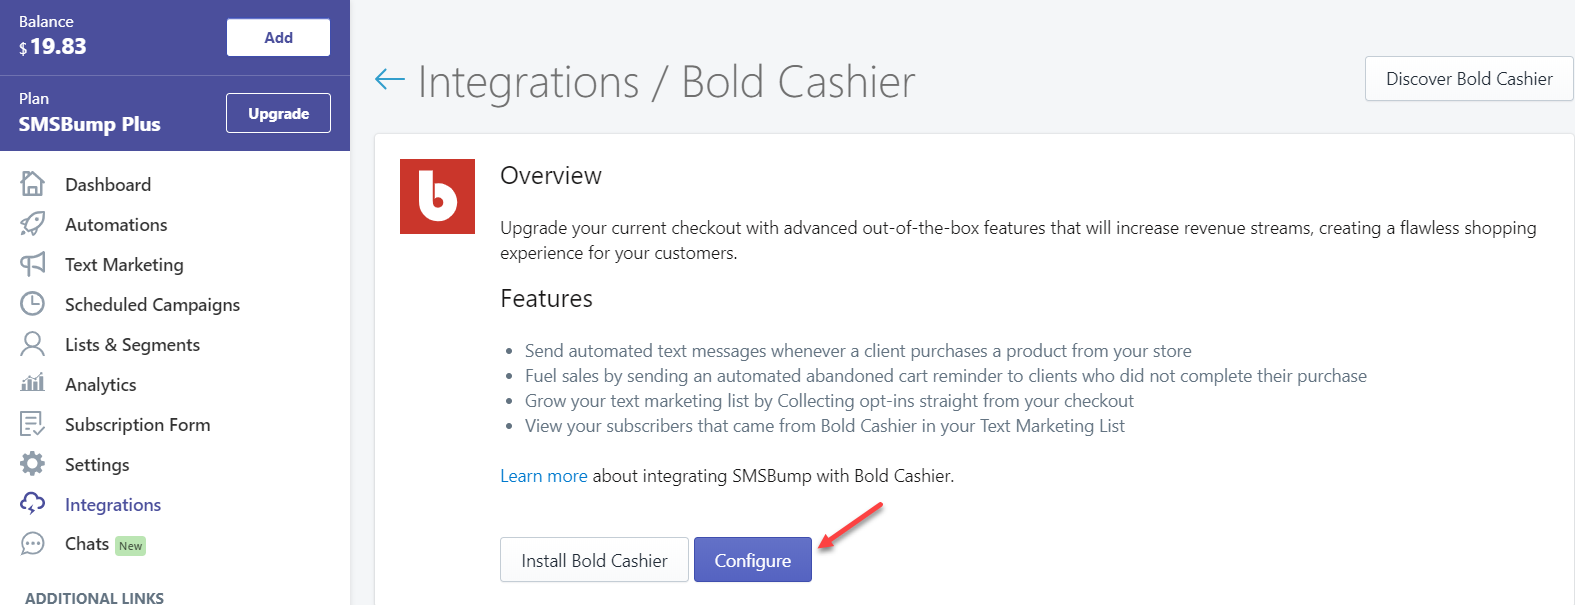 integrations_bold_cashier_SMSBump